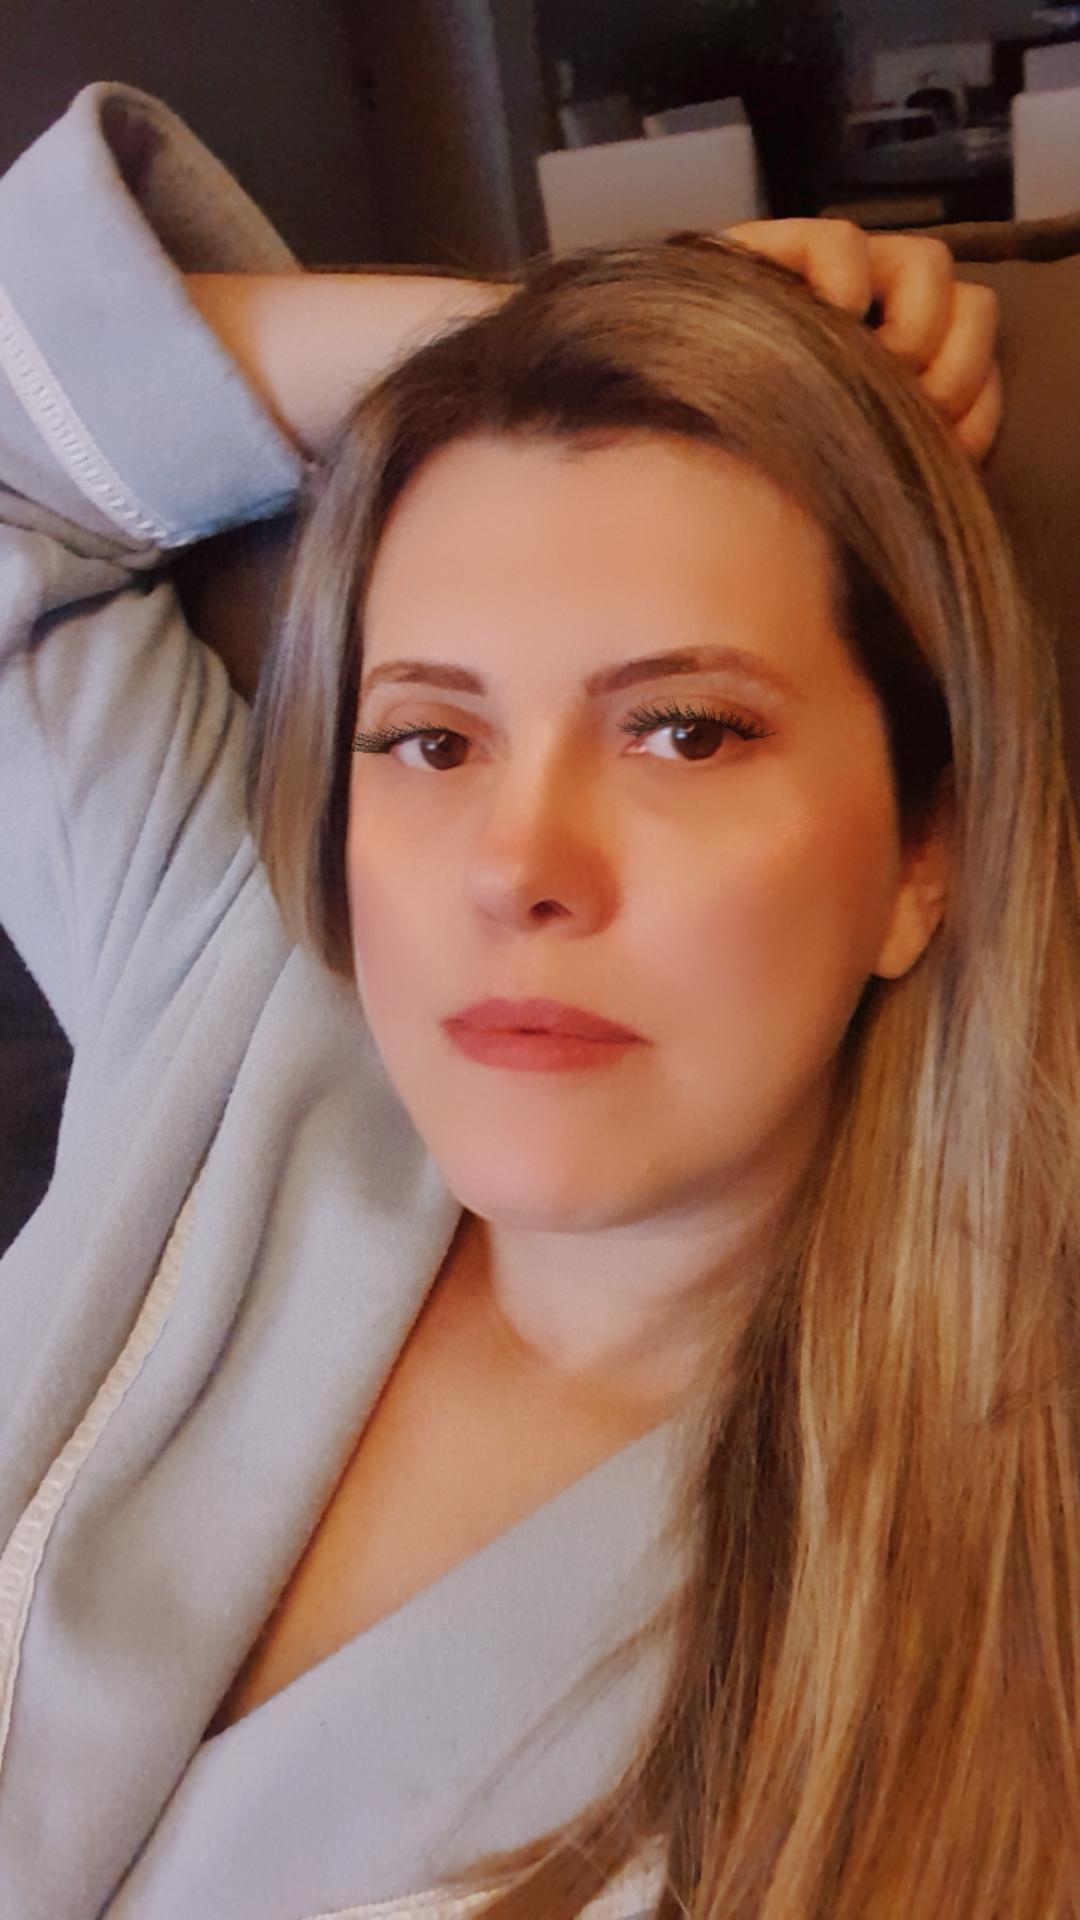 Priscila Miranda Fernandes de Araújo